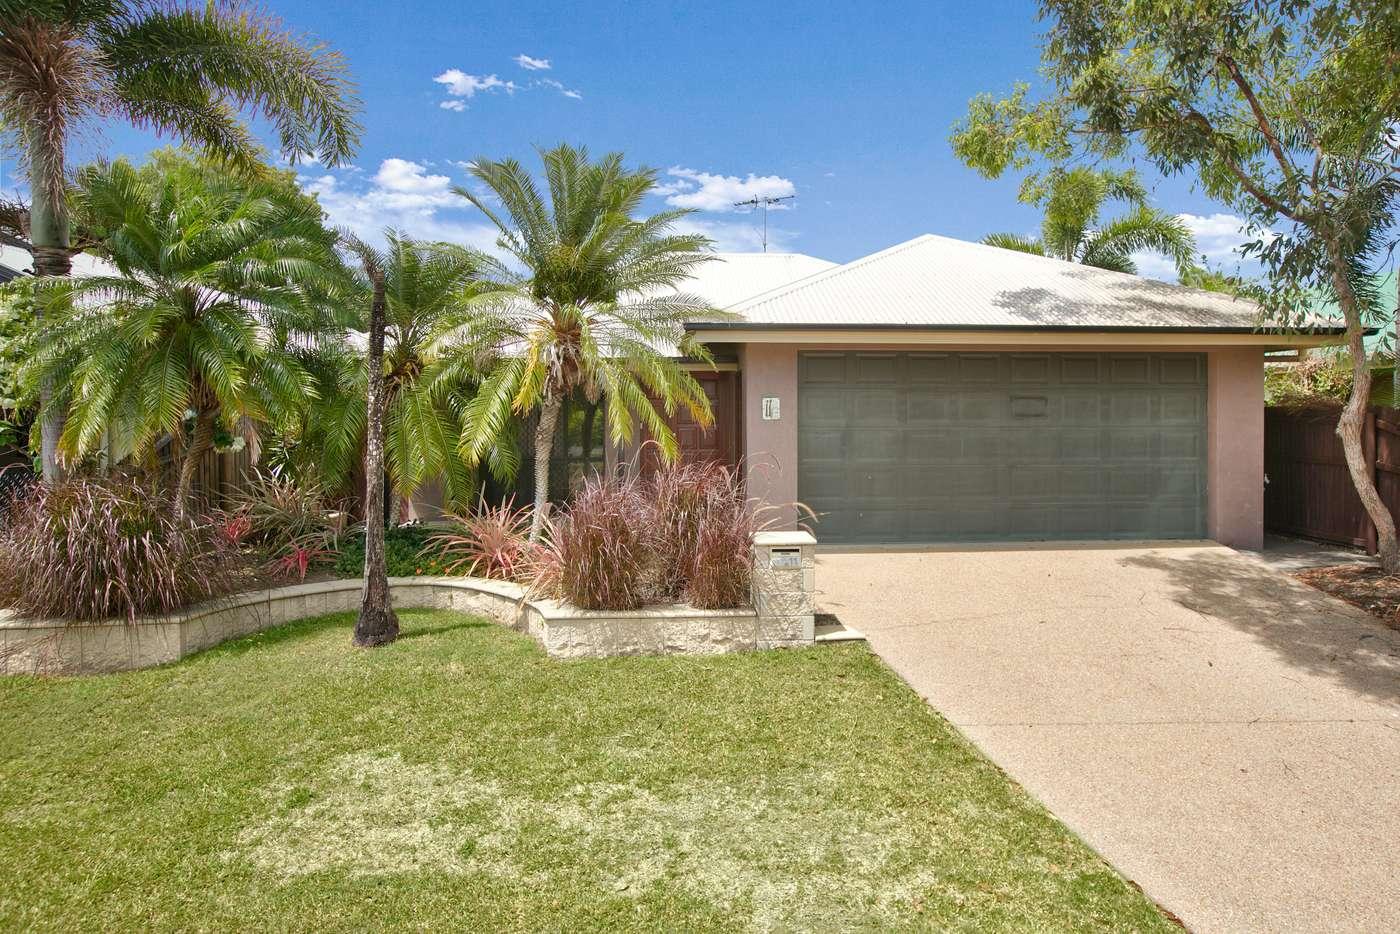 Main view of Homely house listing, 11 Narabeen Street, Kewarra Beach, QLD 4879